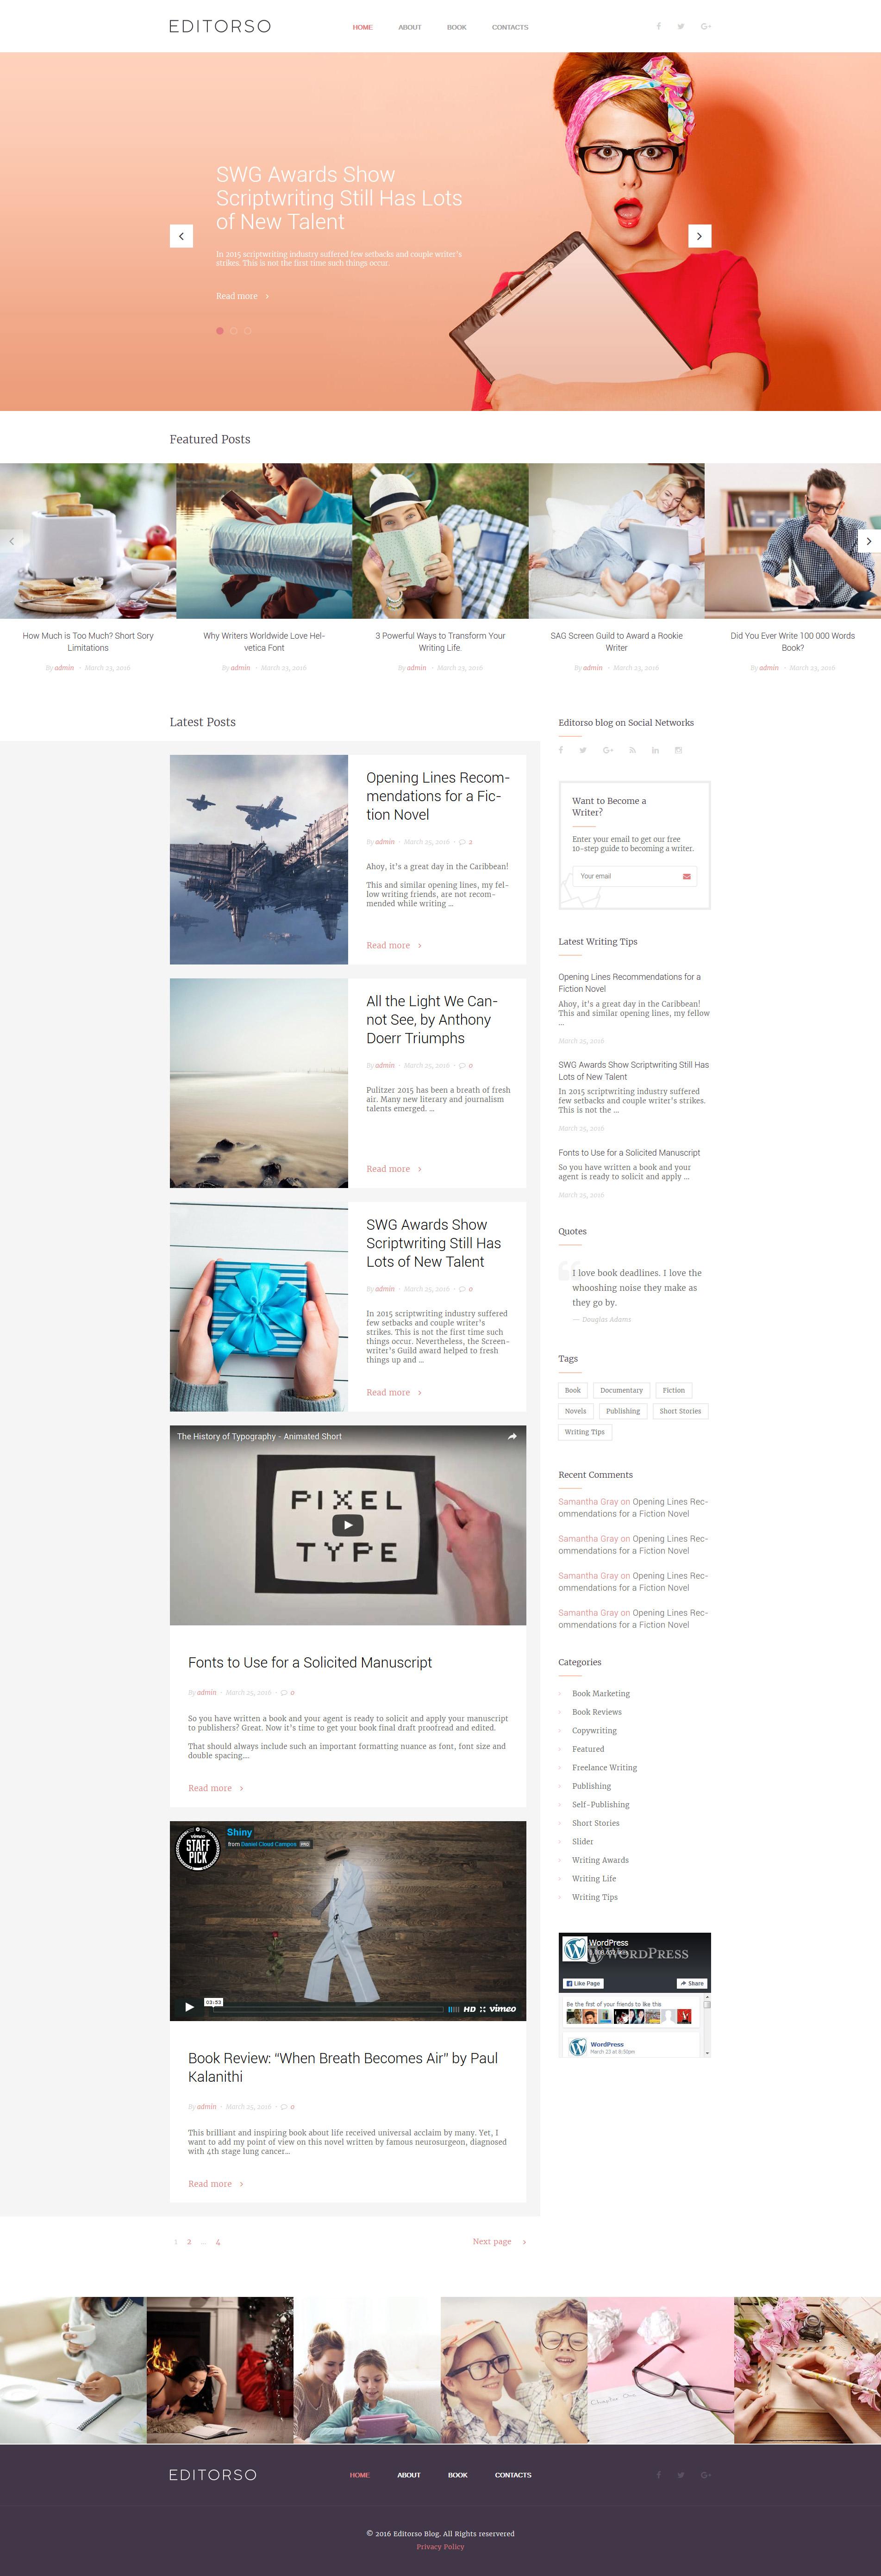 """Editorso - Journalist Blog"" 响应式WordPress模板 #58513"